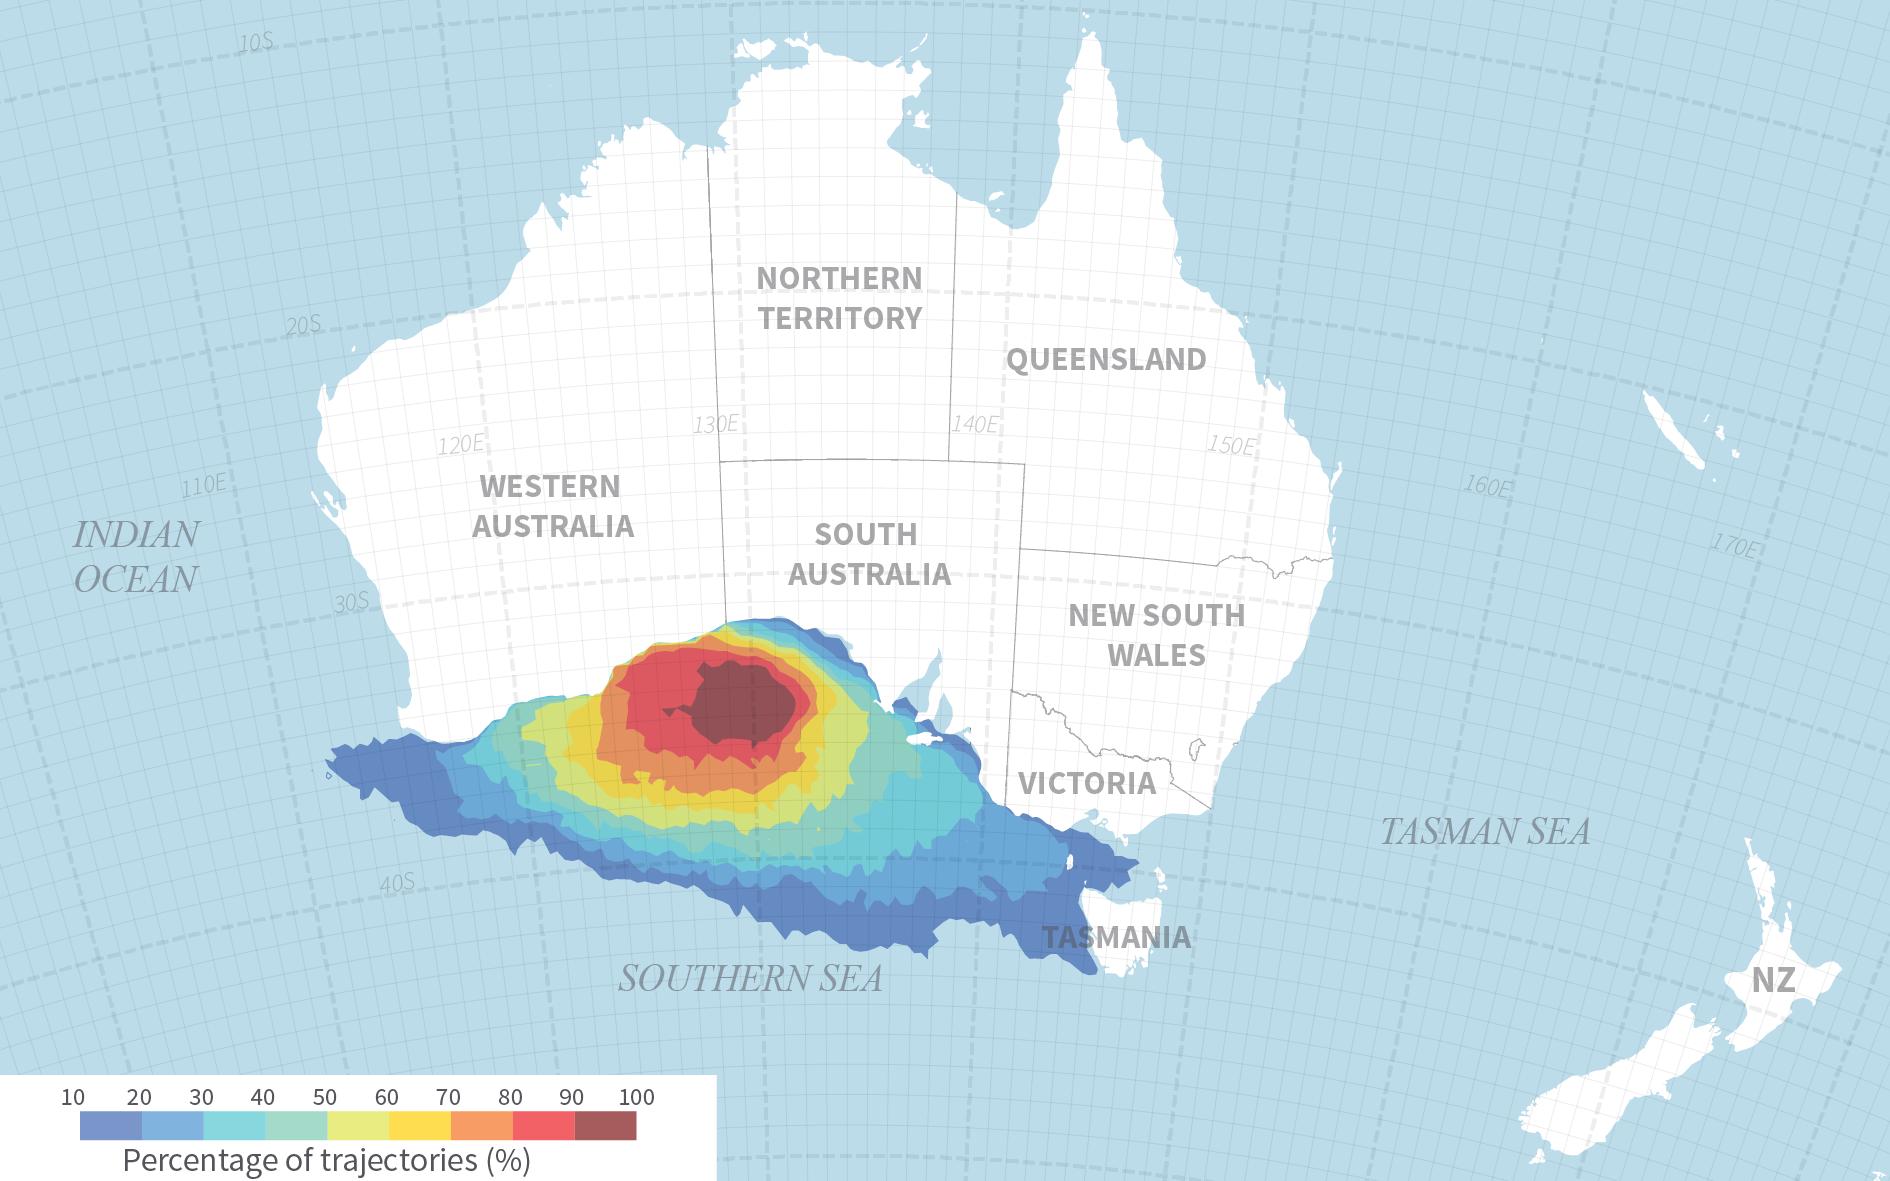 Australia Map Great Australian Bight.The Risks Great Australian Bight Alliance